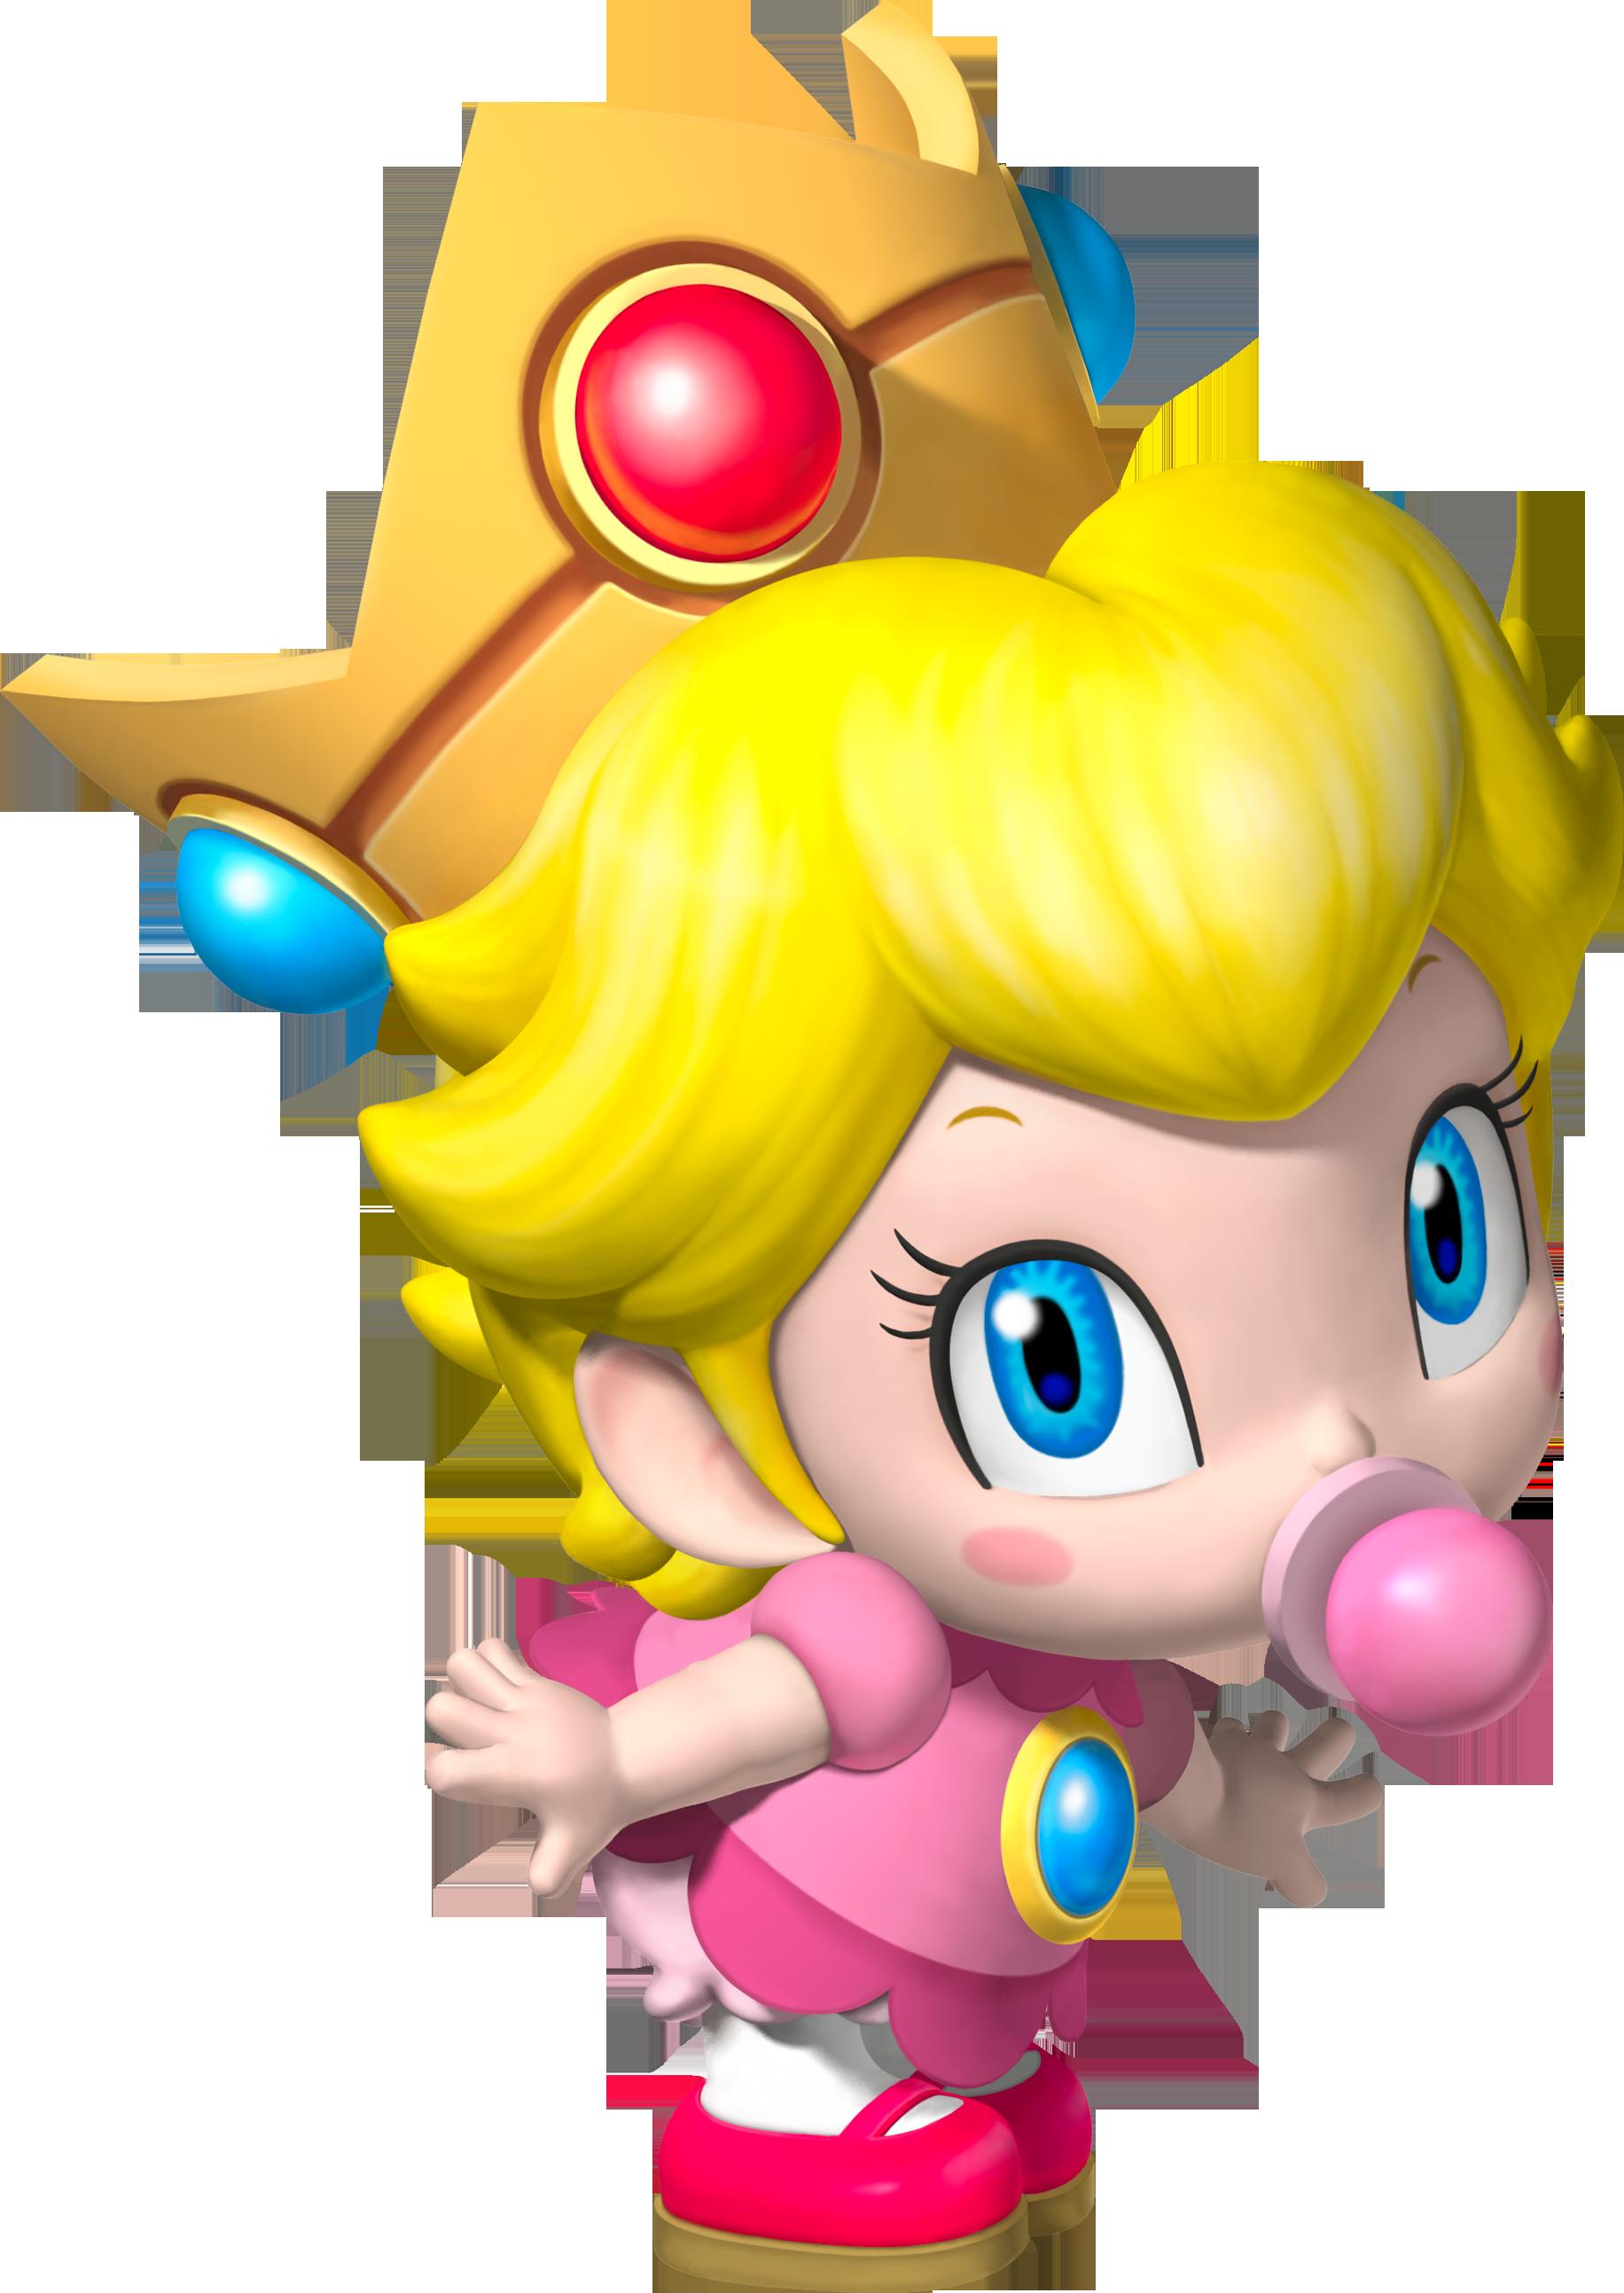 Coloriage Bebe Harmonie.Beau Coloriage A Imprimer Princesse Peach Mademoiselleosaki Com